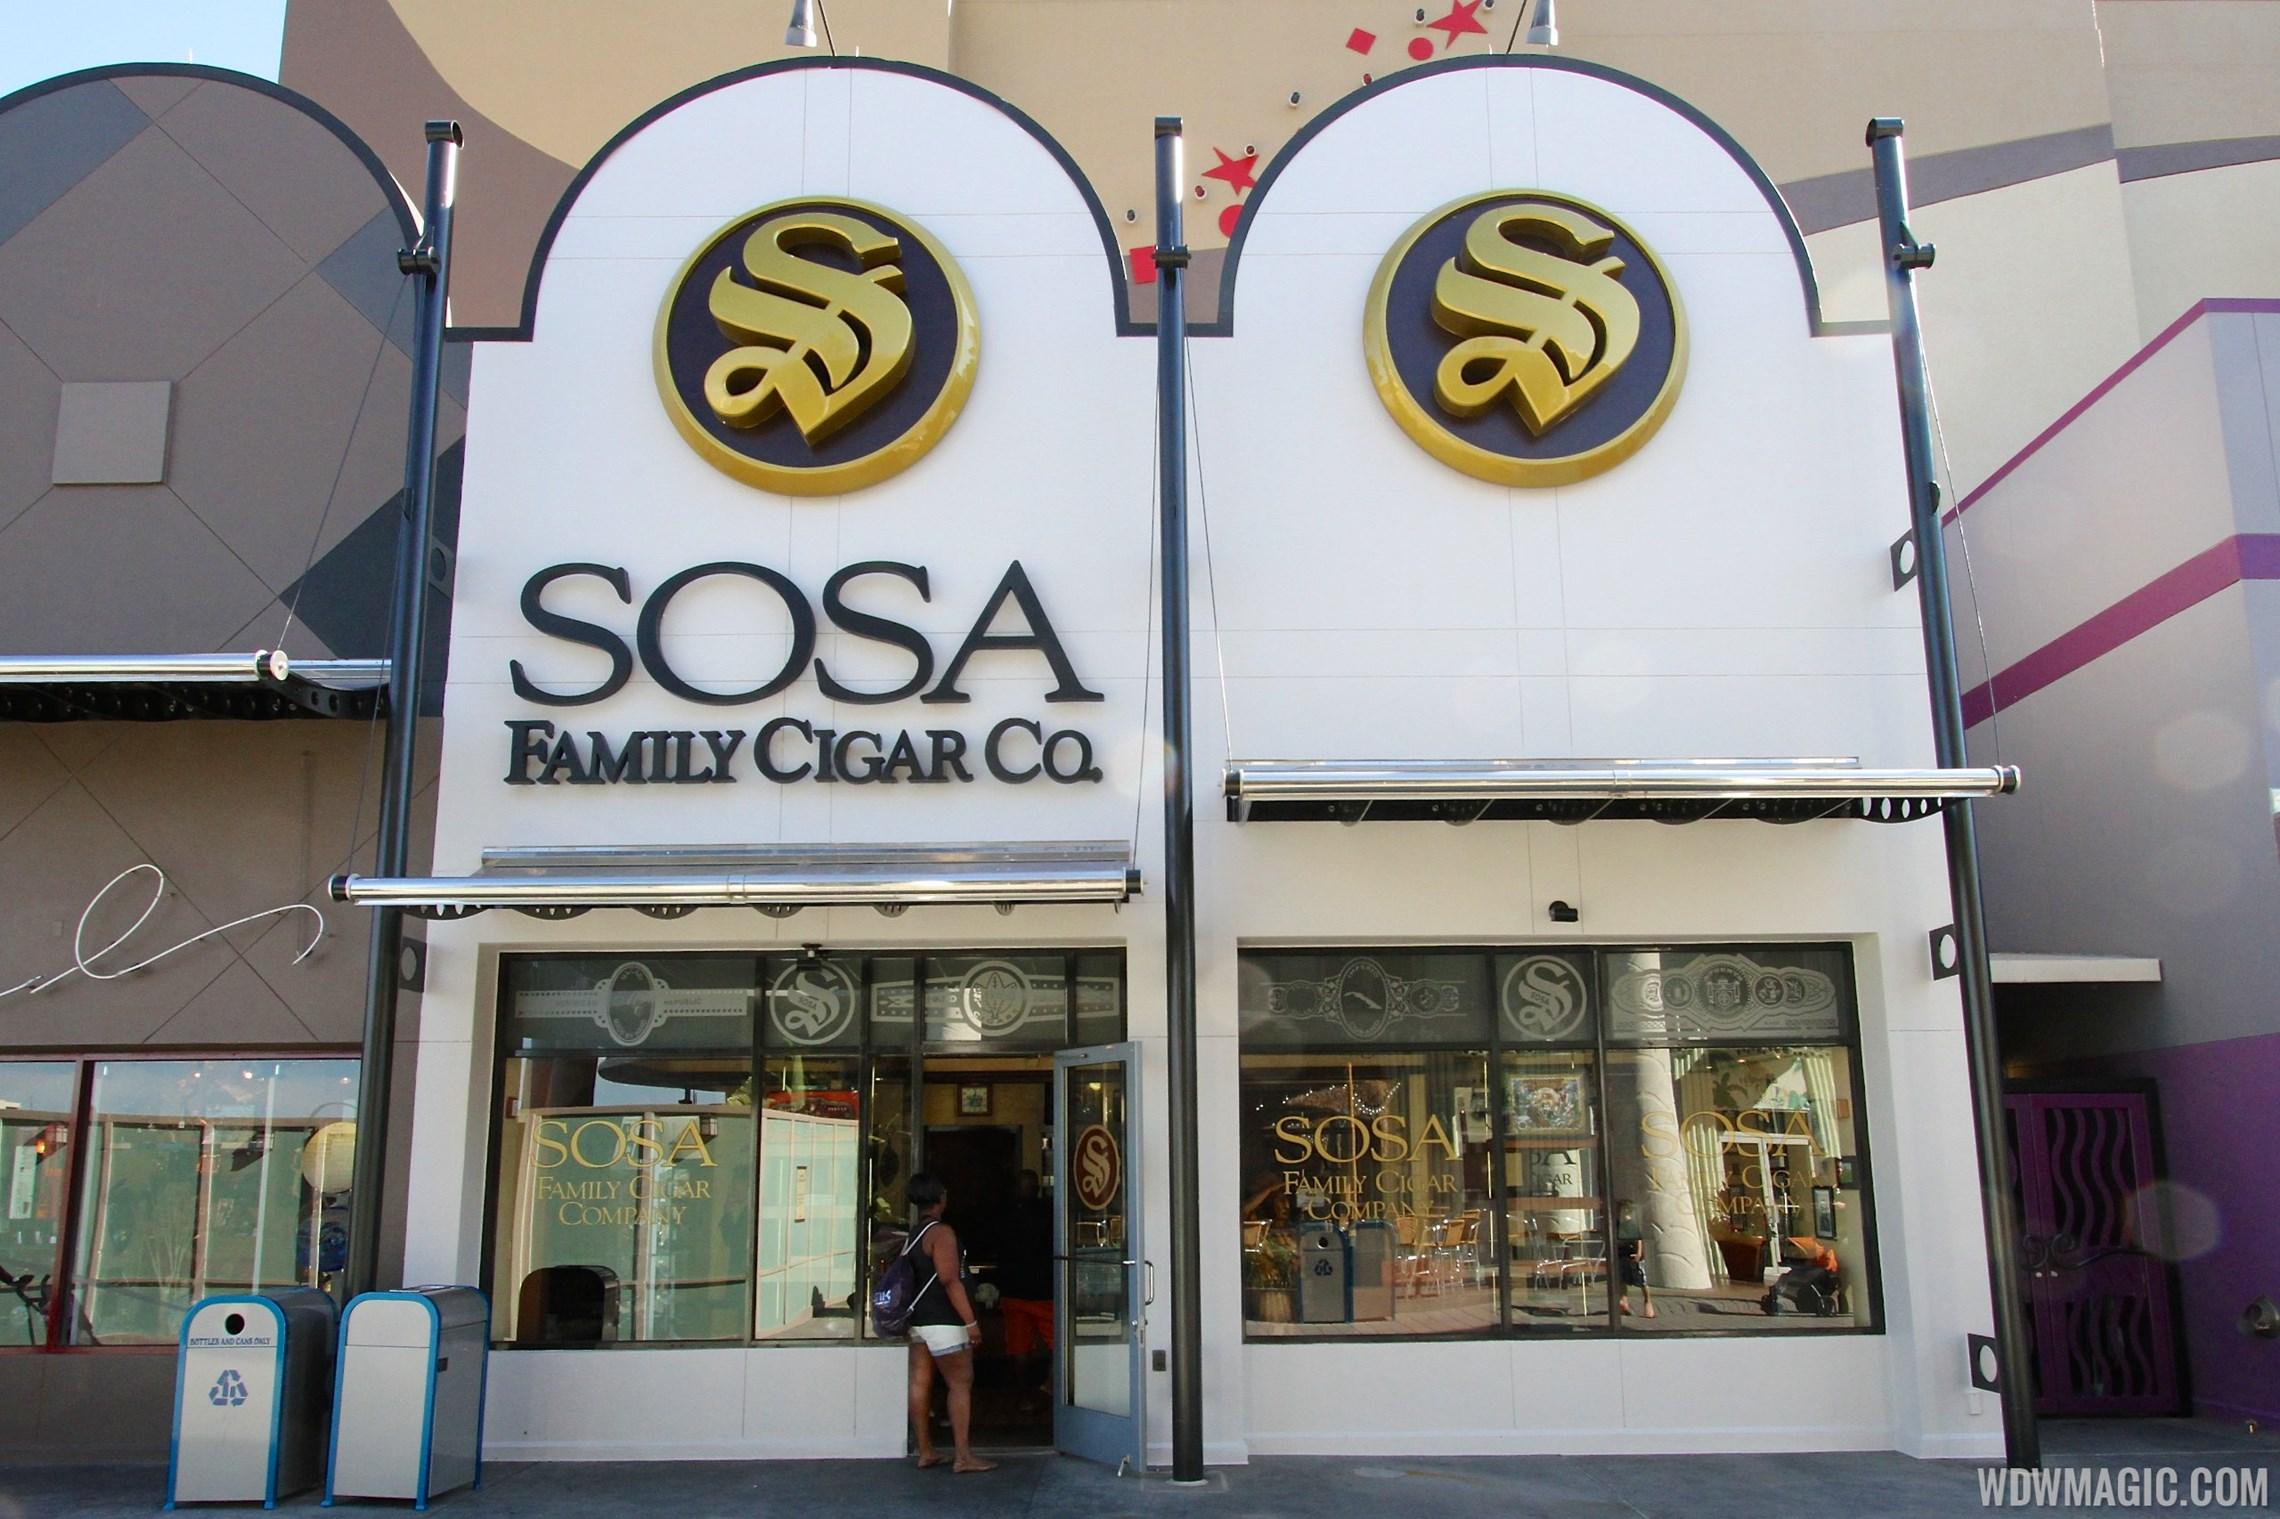 New Disney Springs urban color scheme at Sosa Cigars